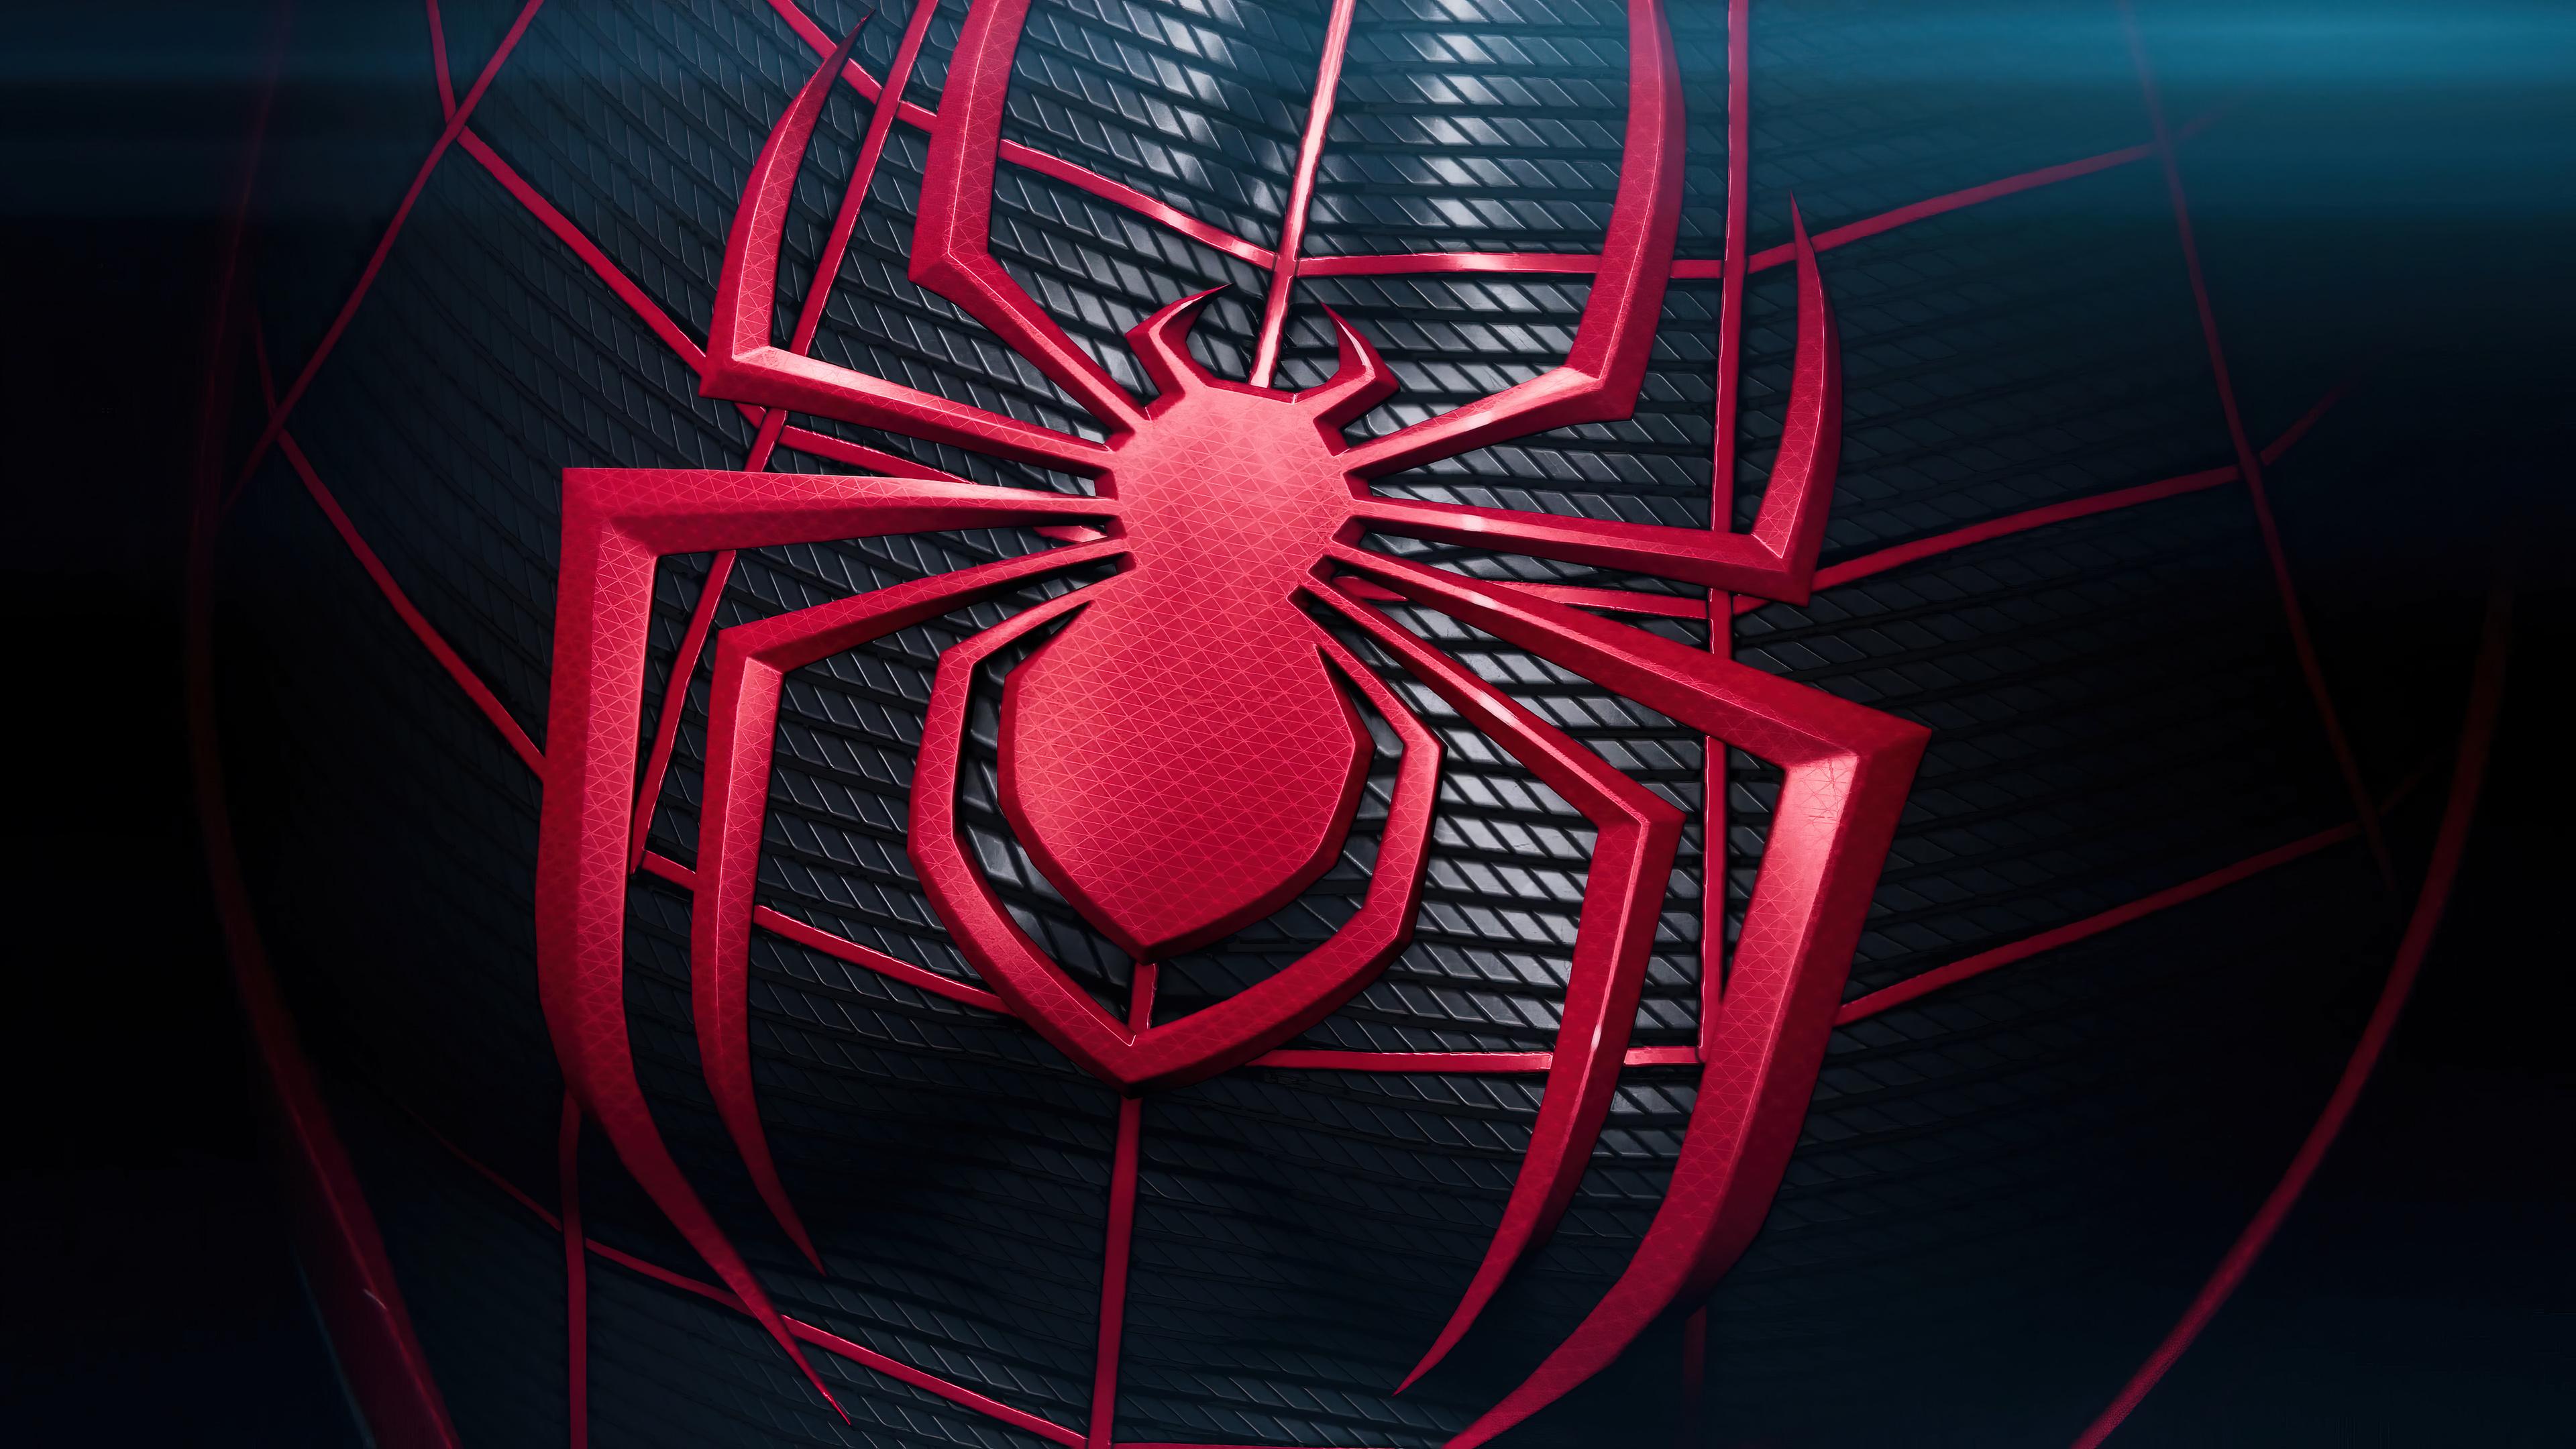 Wallpaper Spider on suit